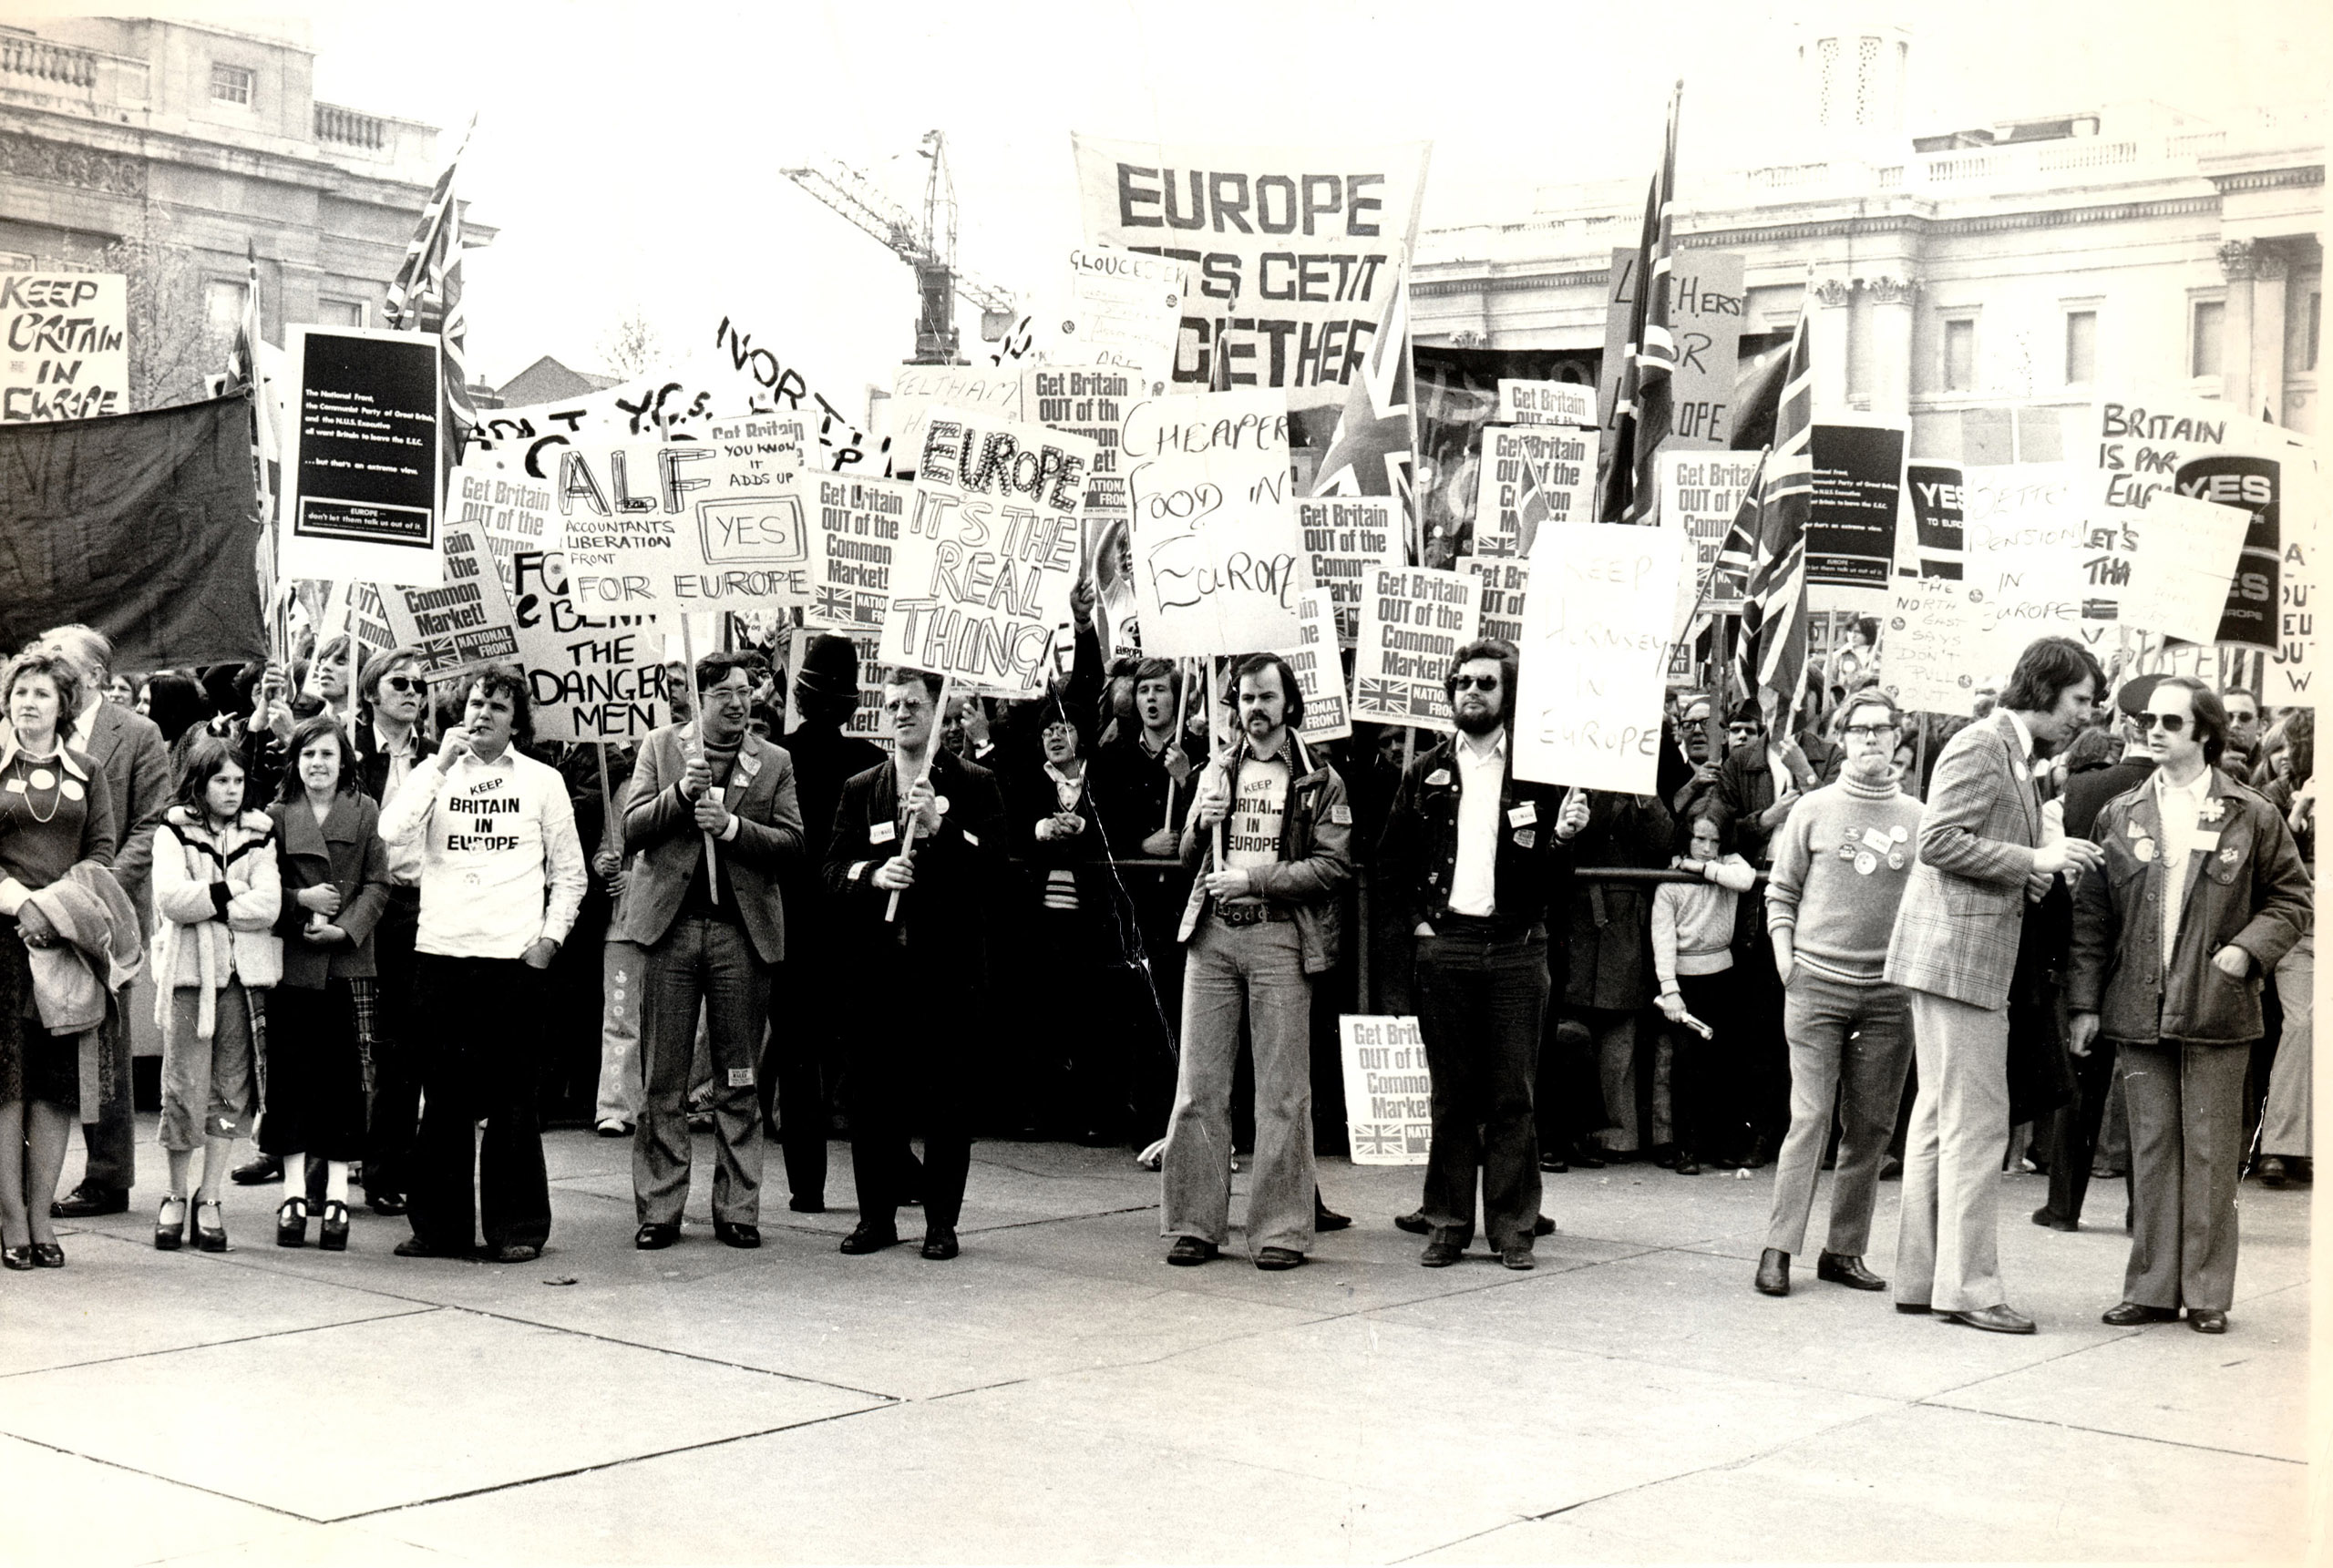 Pro-Common Market Youth Rally at Trafalgar Square, London, 1975.